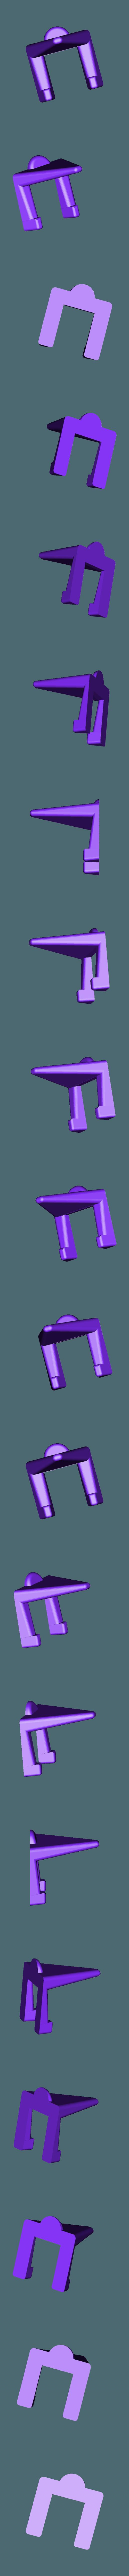 support guitare.stl Download free STL file Stand guitar box • 3D printer template, rfbat